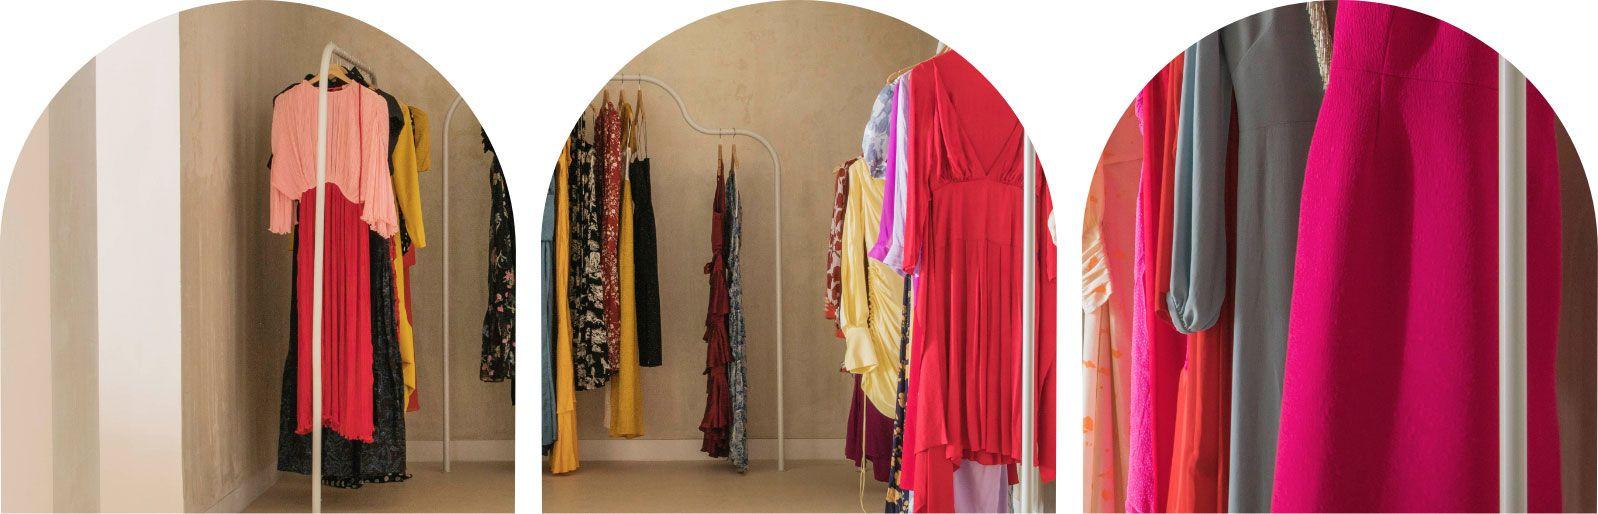 triadaSINTITULAR_tienda_vestidosrosa_borow